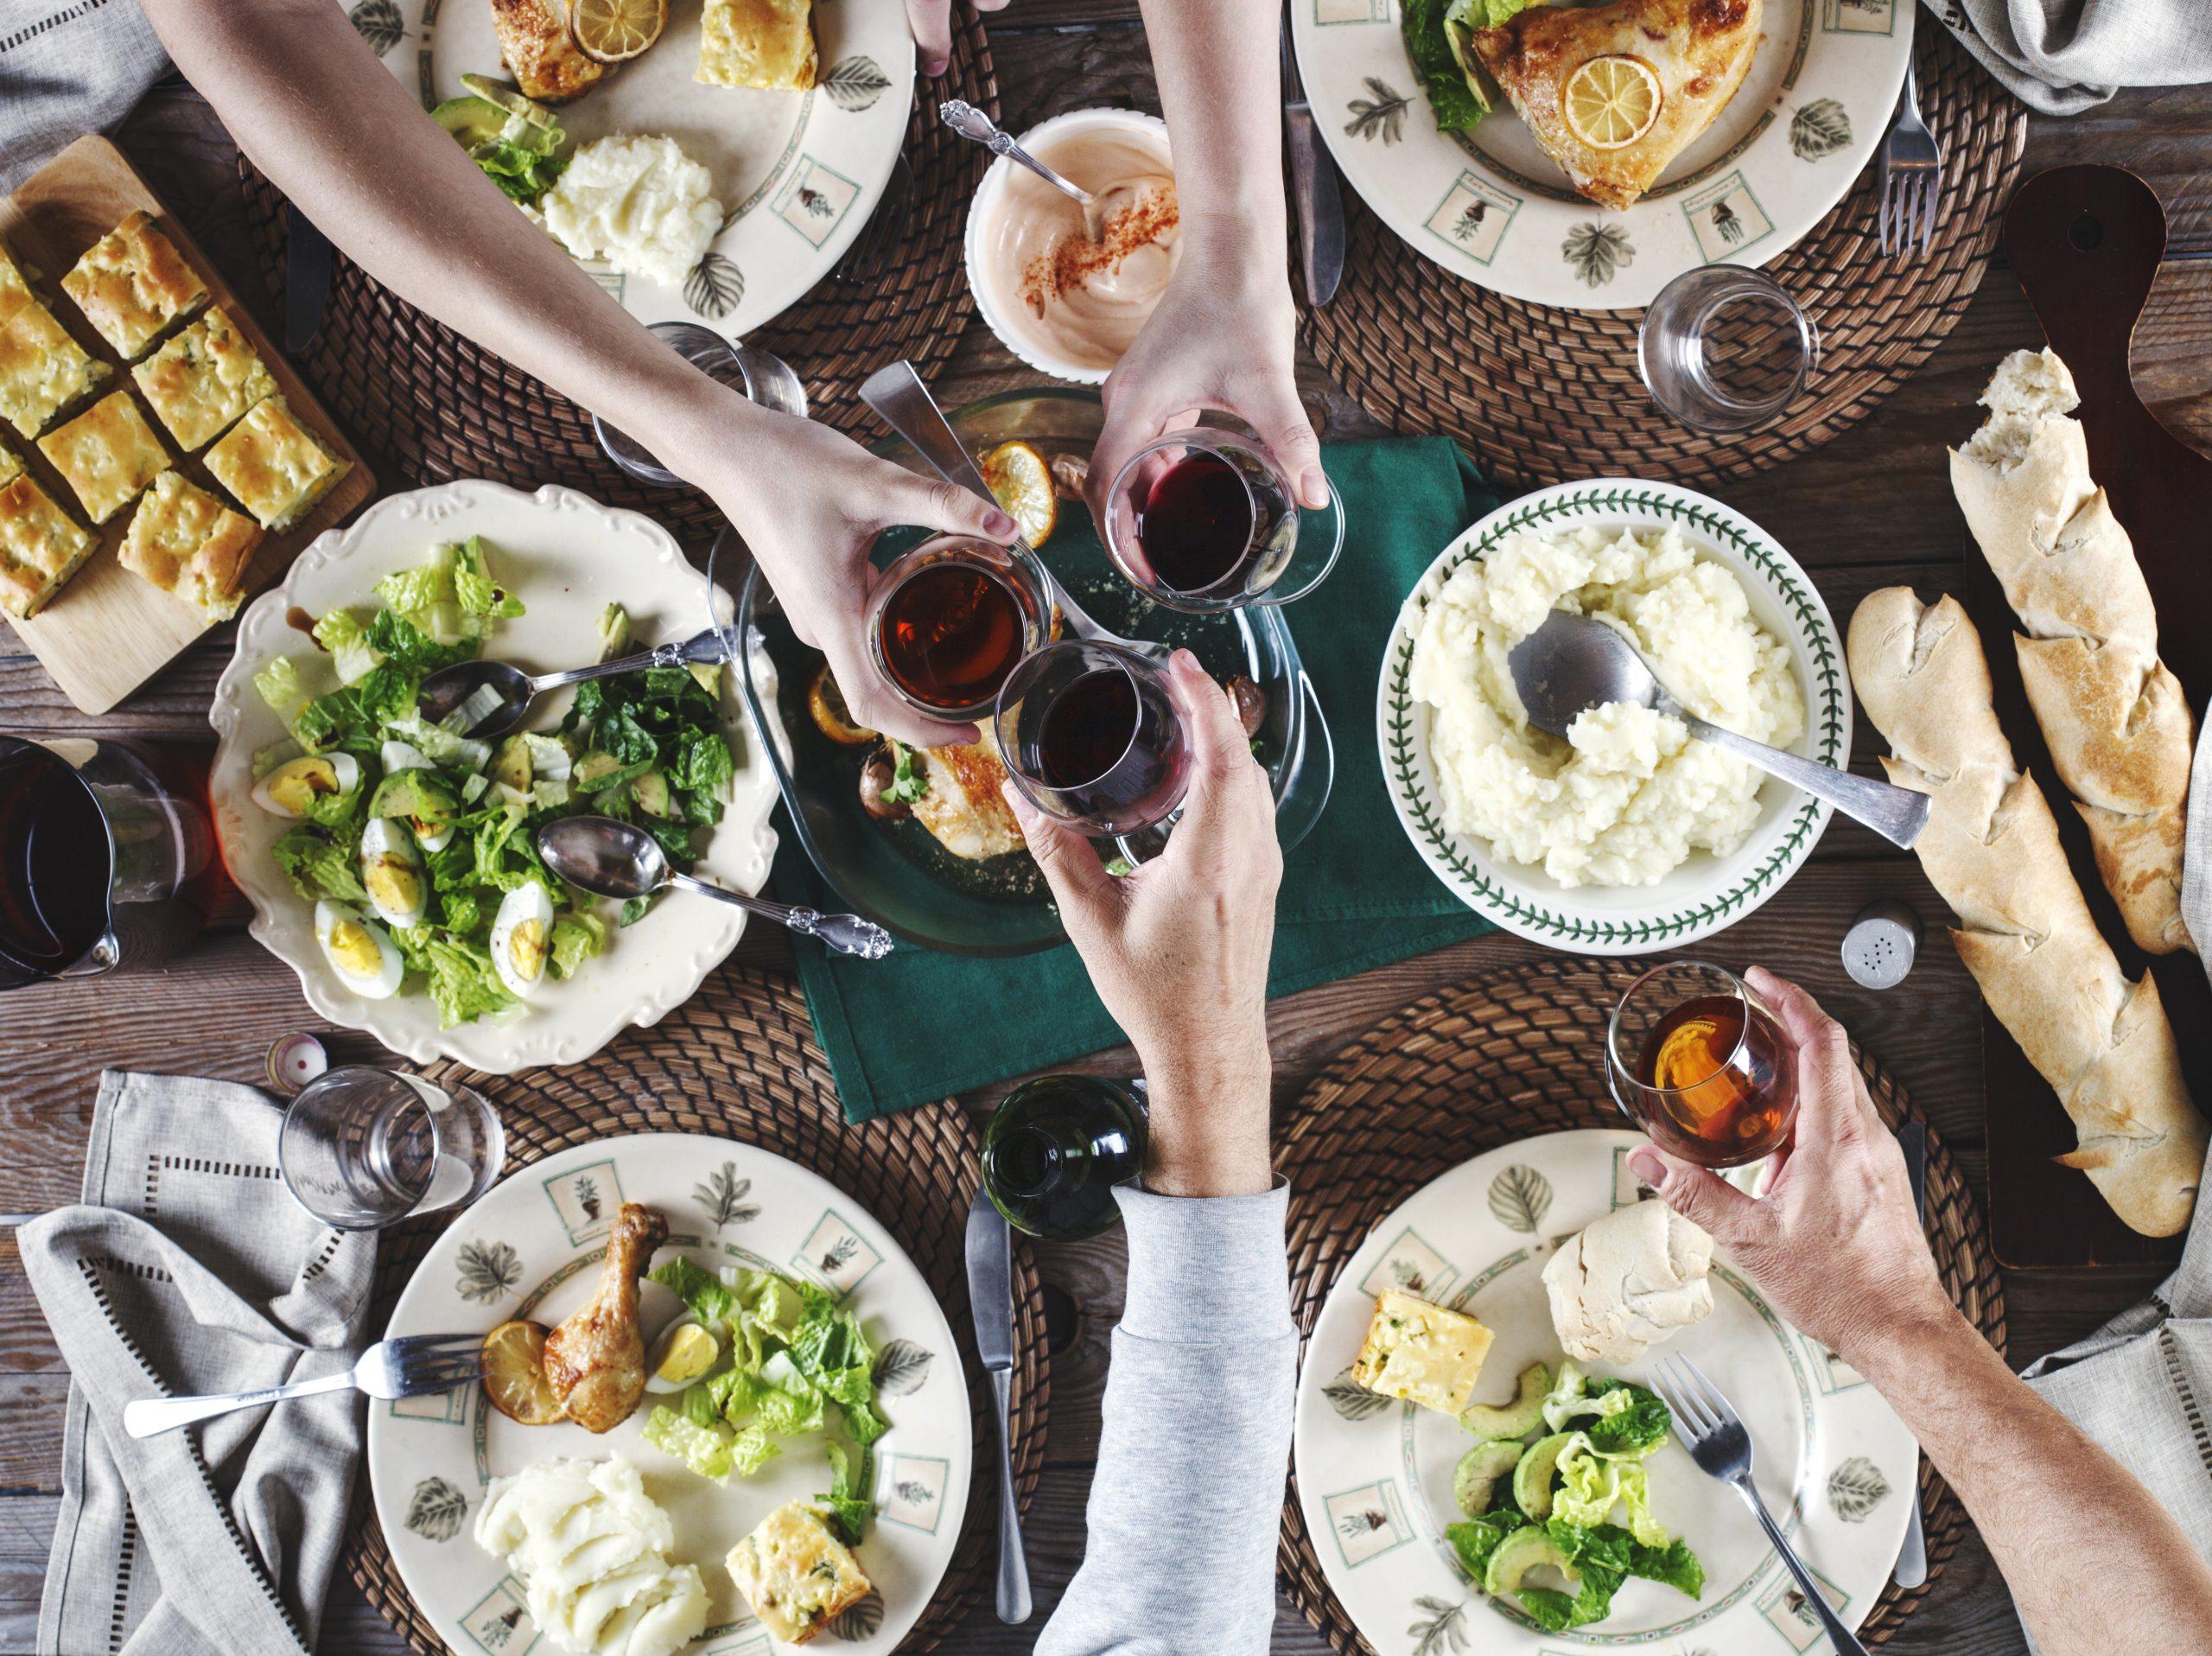 order food and drink online